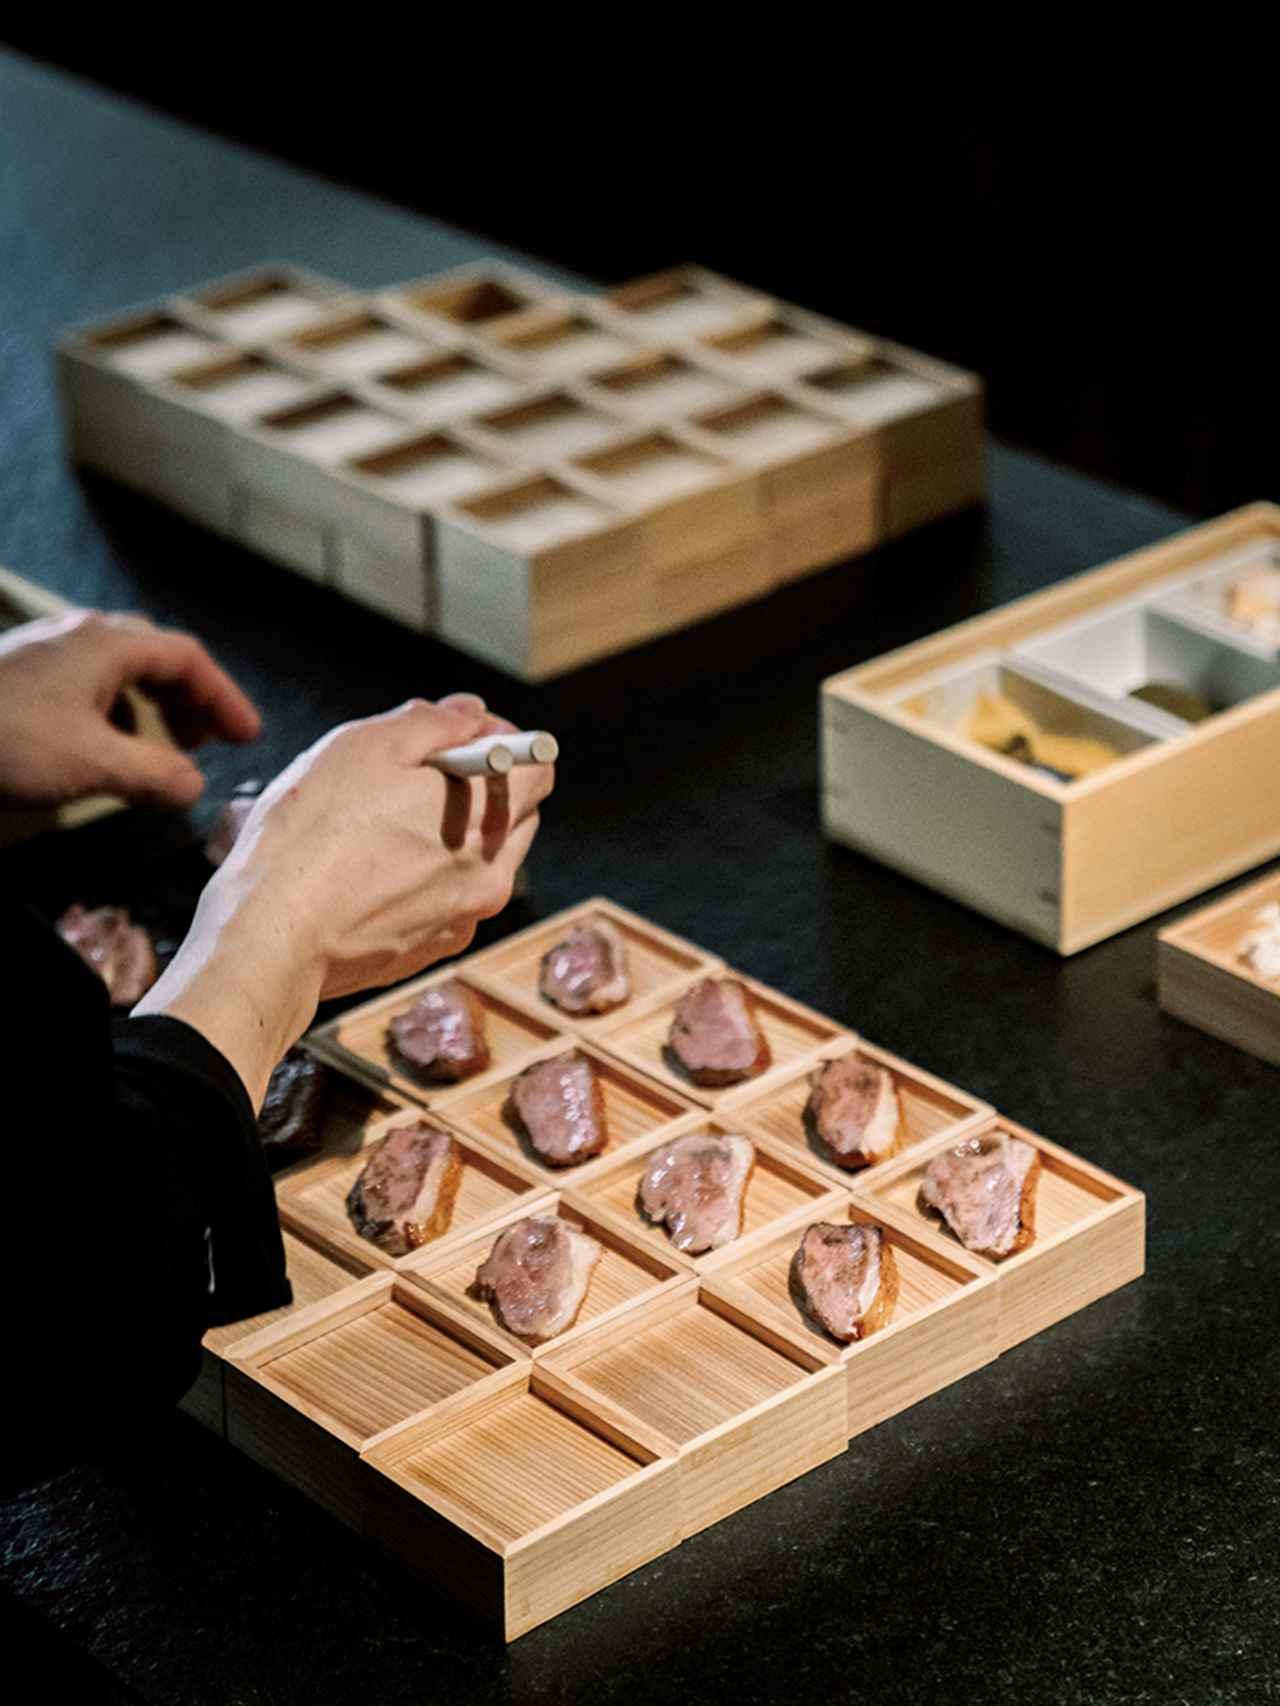 Images : 7番目の画像 - 「OGATA Paris ーー パリの空間に映る 日本の食とデザインの粋」のアルバム - T JAPAN:The New York Times Style Magazine 公式サイト